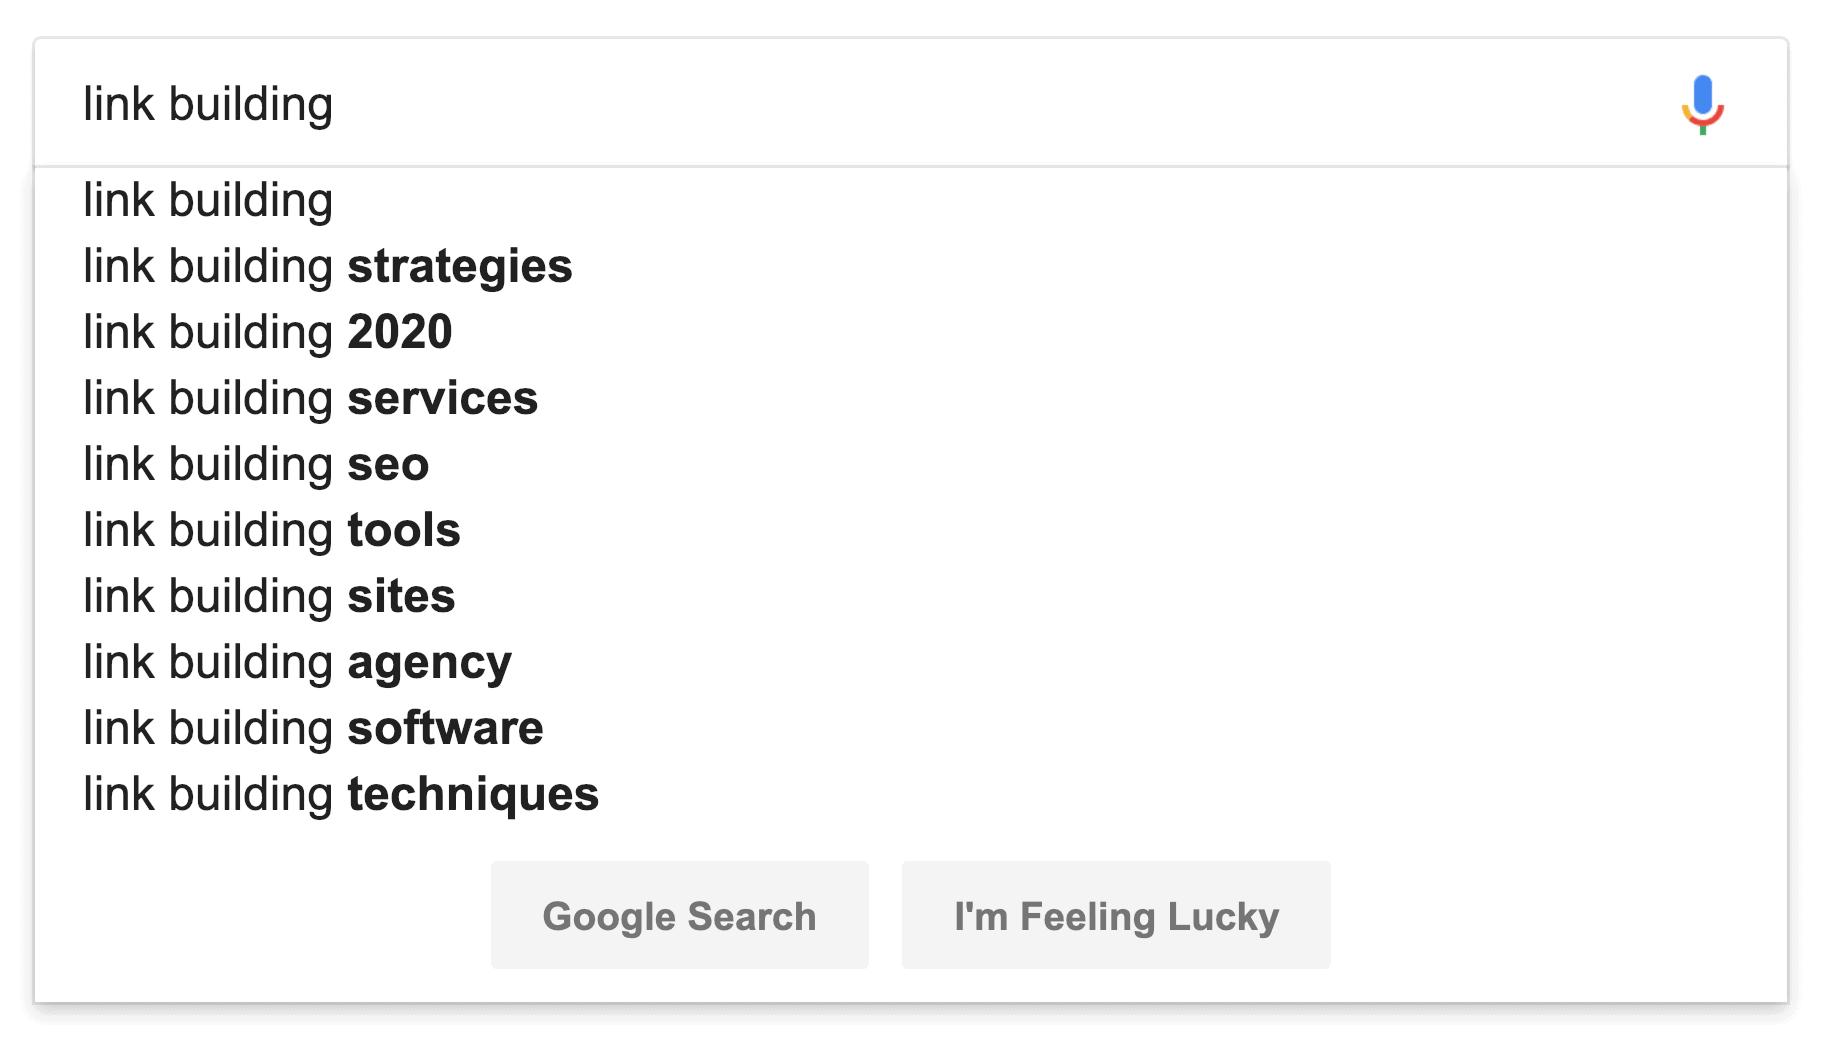 Google Suggest Link Building